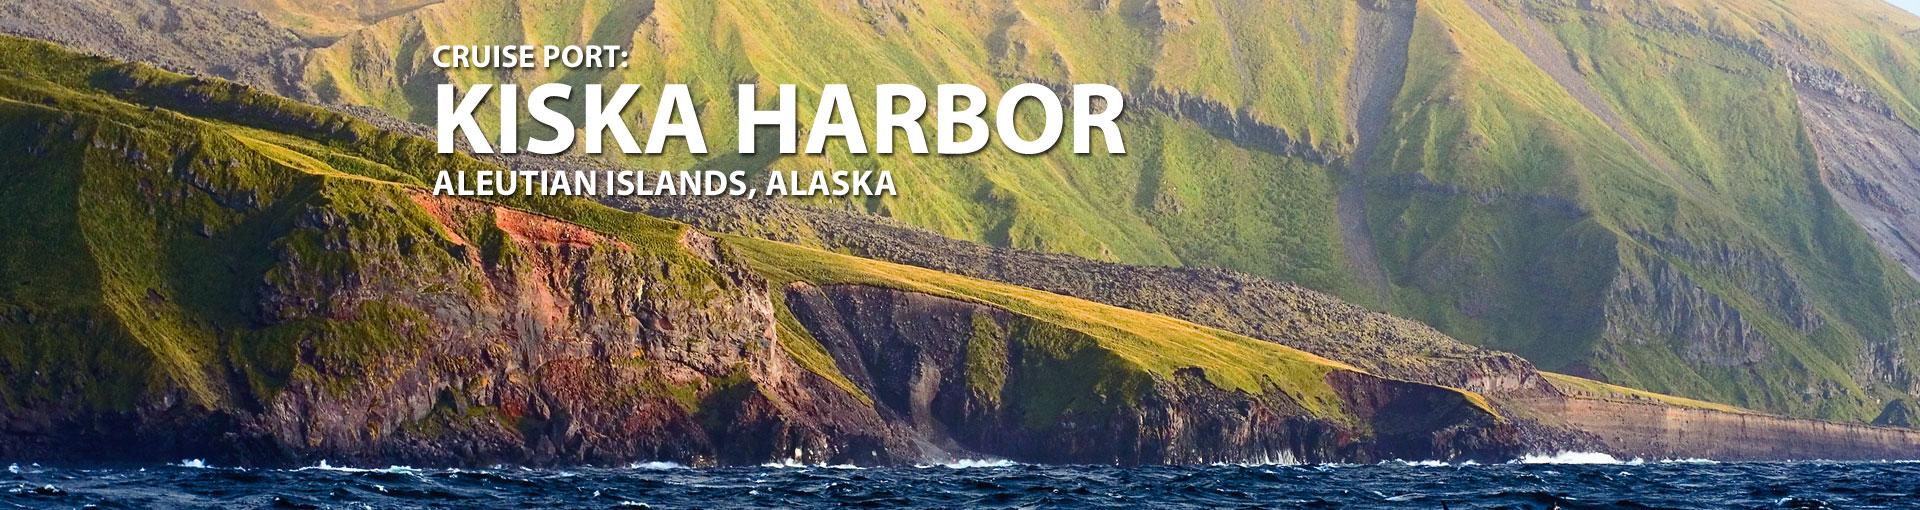 Cruises to Kiska Harbor, Aleutian Islands, Alaska